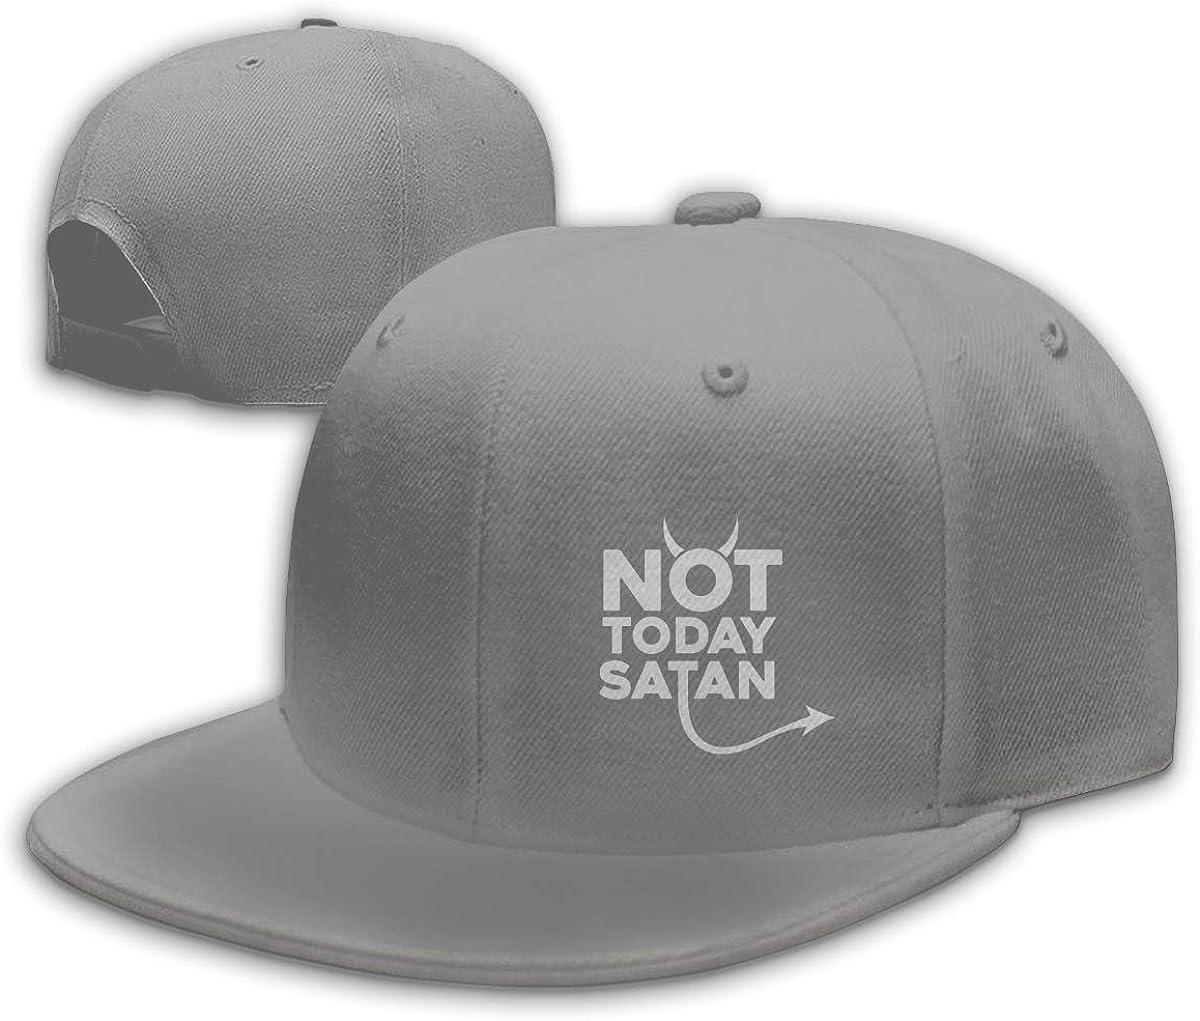 JINHBYV Not Today Satan Unisex Adult Adjustable Retro Dad Hat